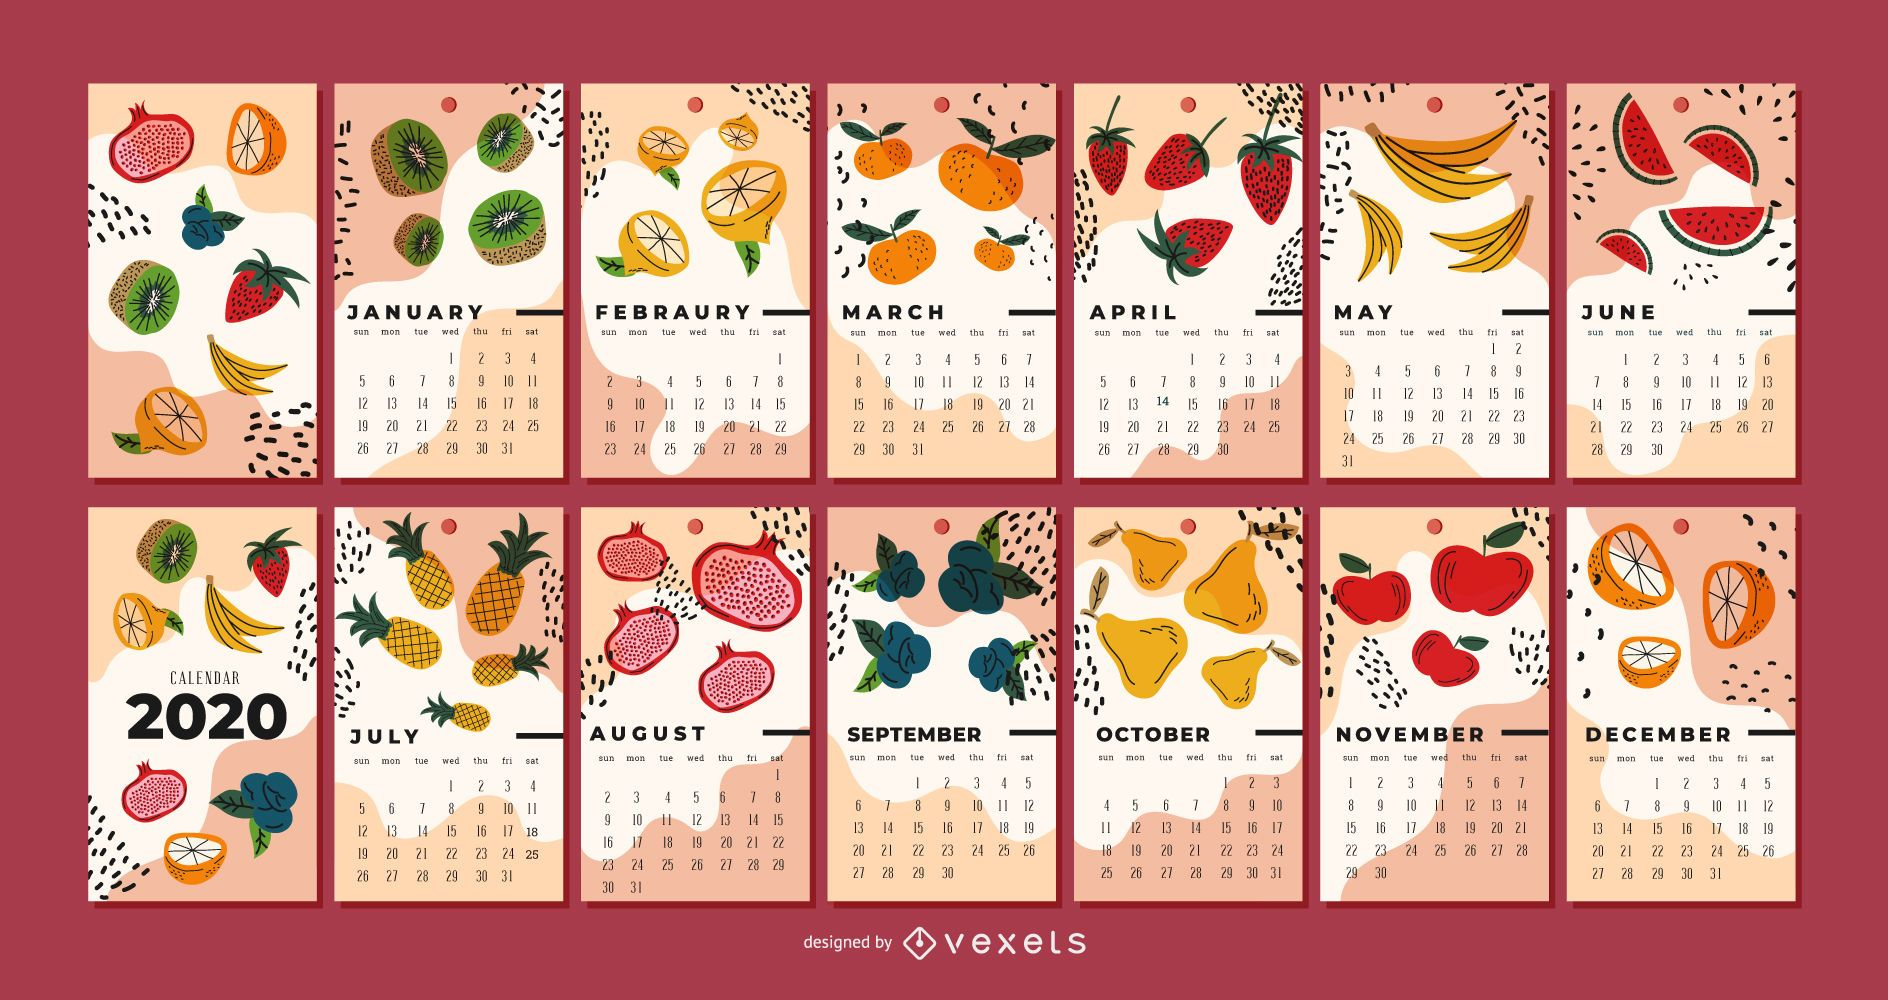 Fruit Illustration 2020 Calendar Design